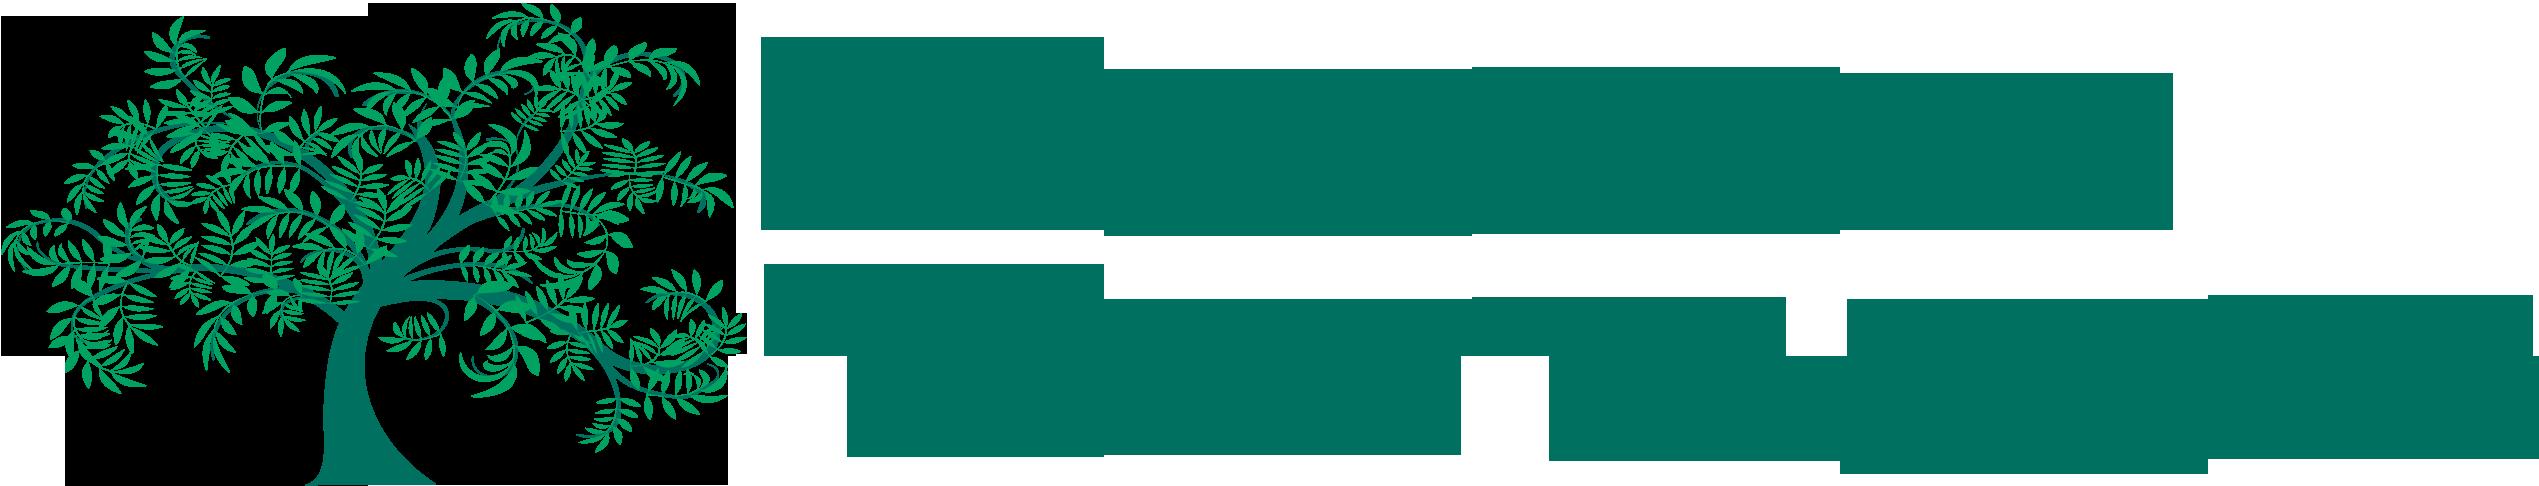 Tuscan Ventures